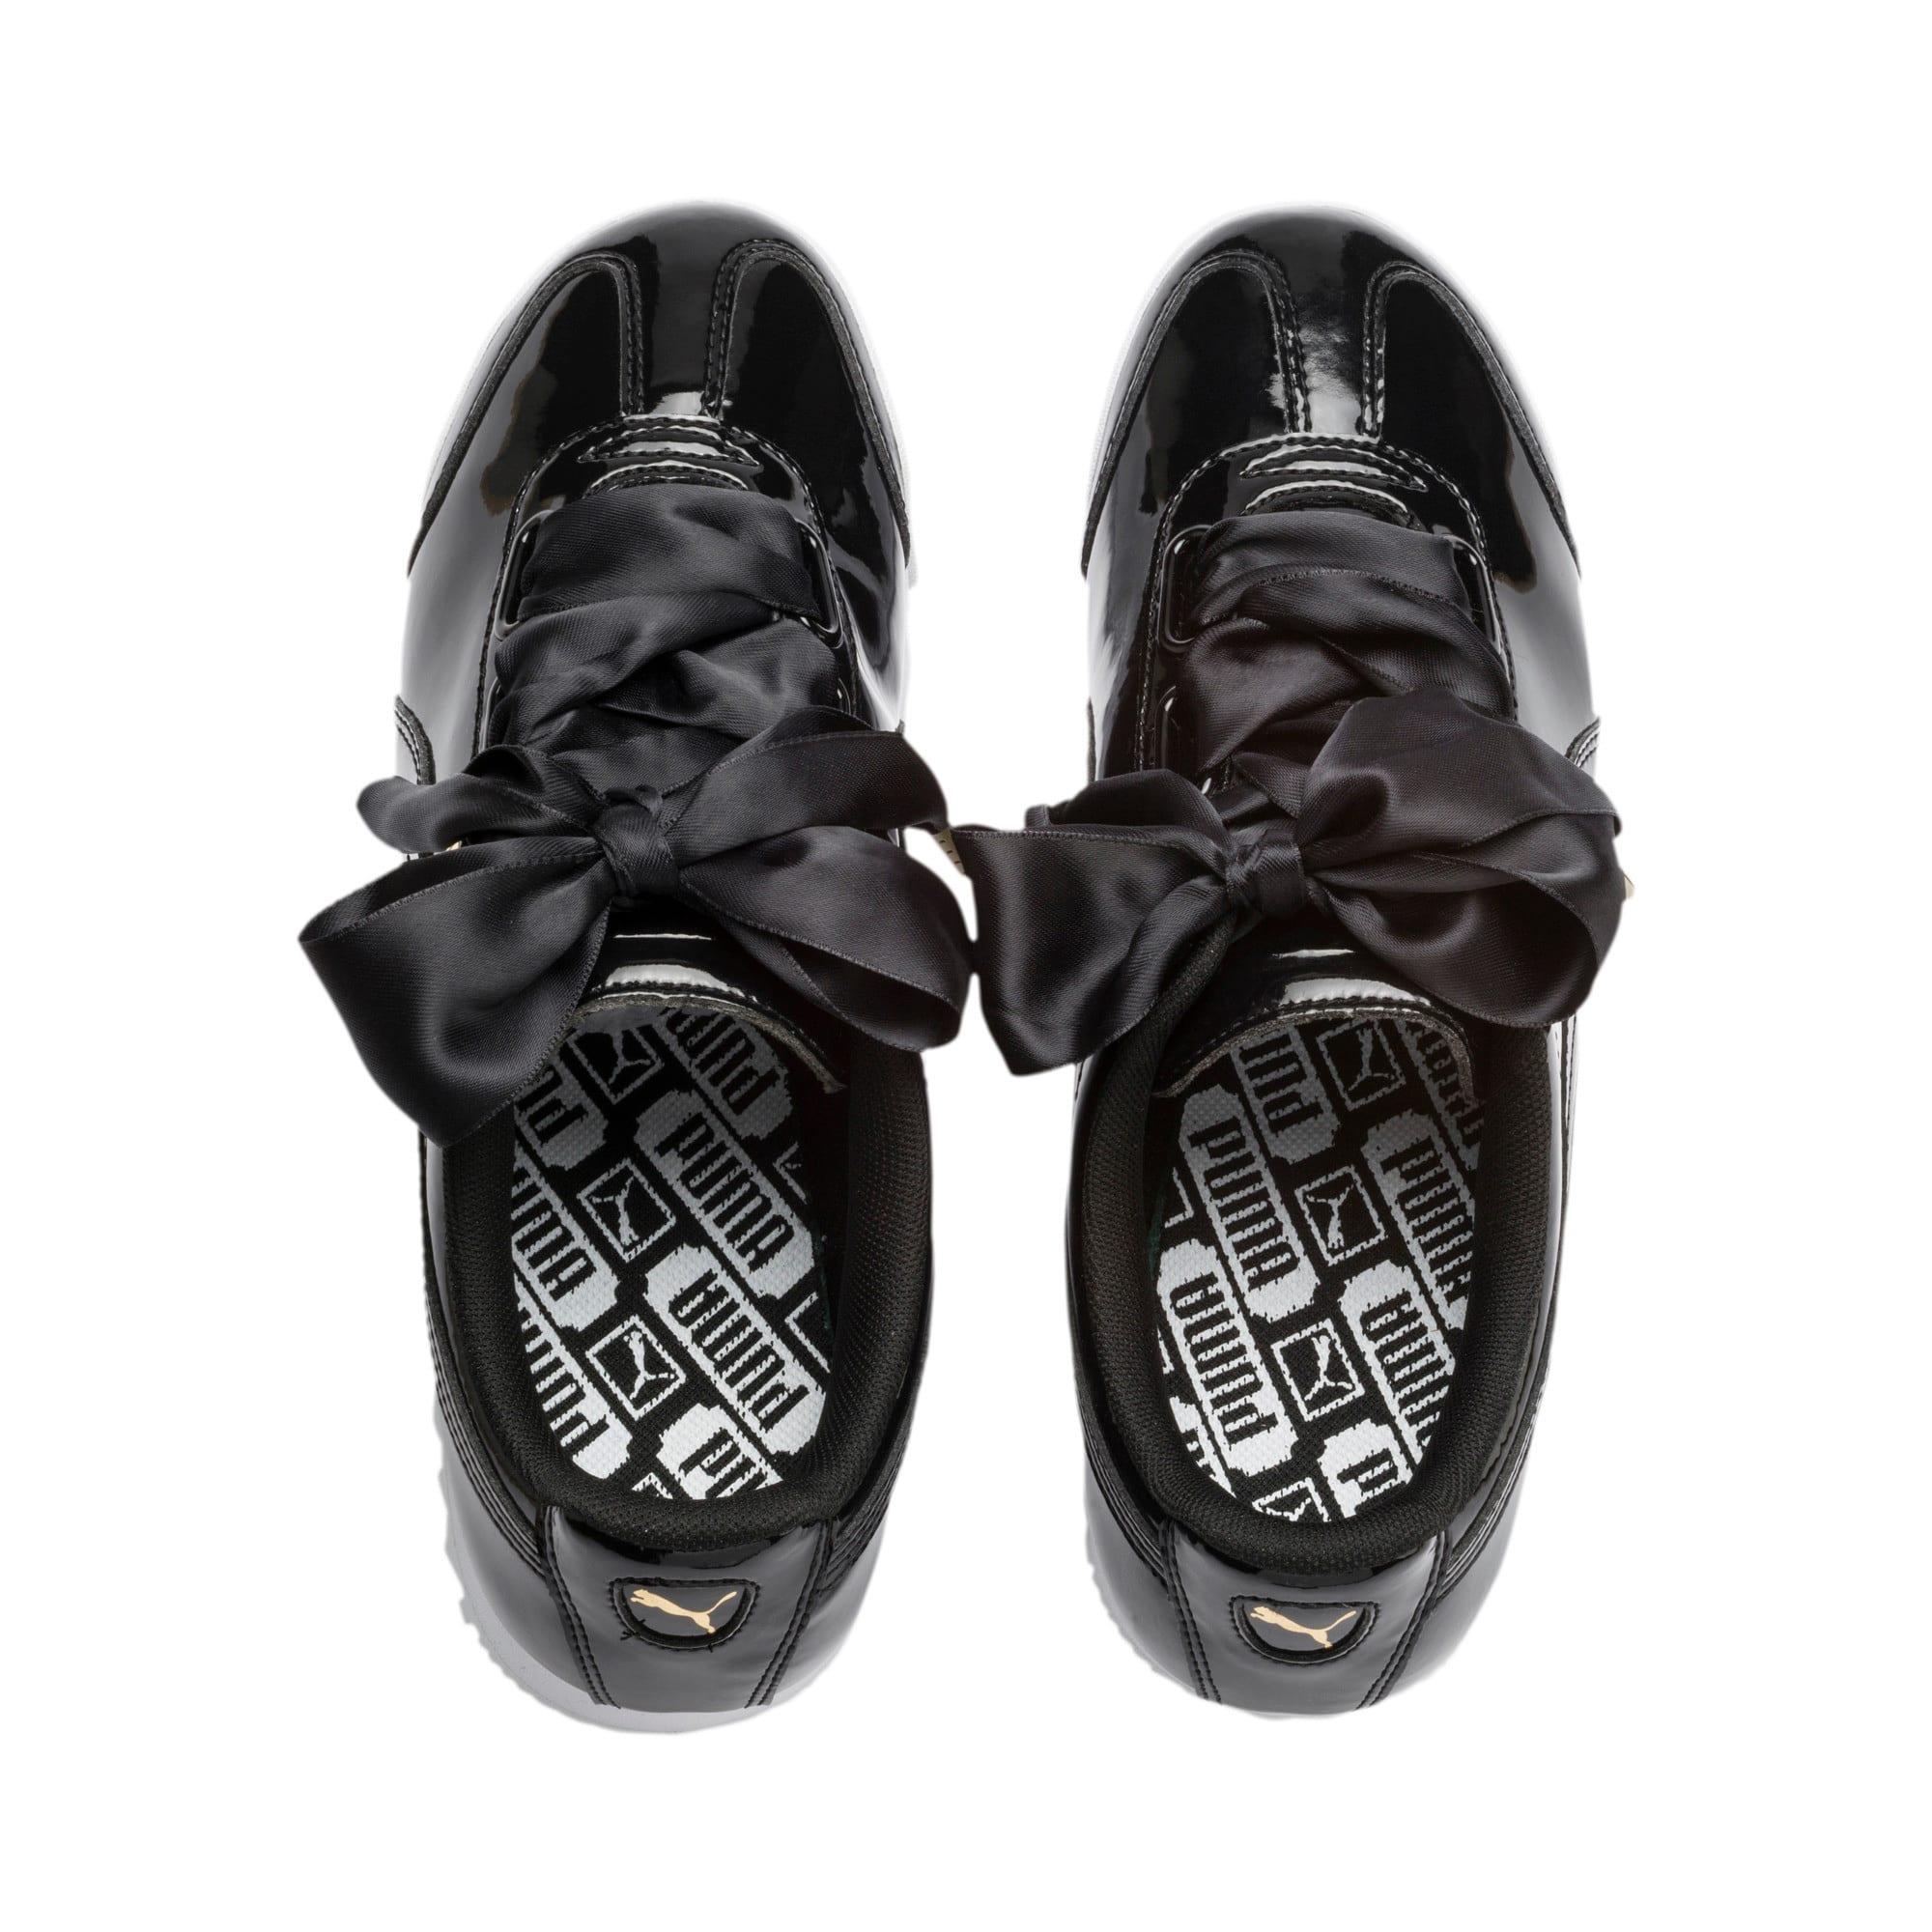 Thumbnail 7 of Roma Heart Patent Women's Sneakers, Puma Black-Puma Team Gold, medium